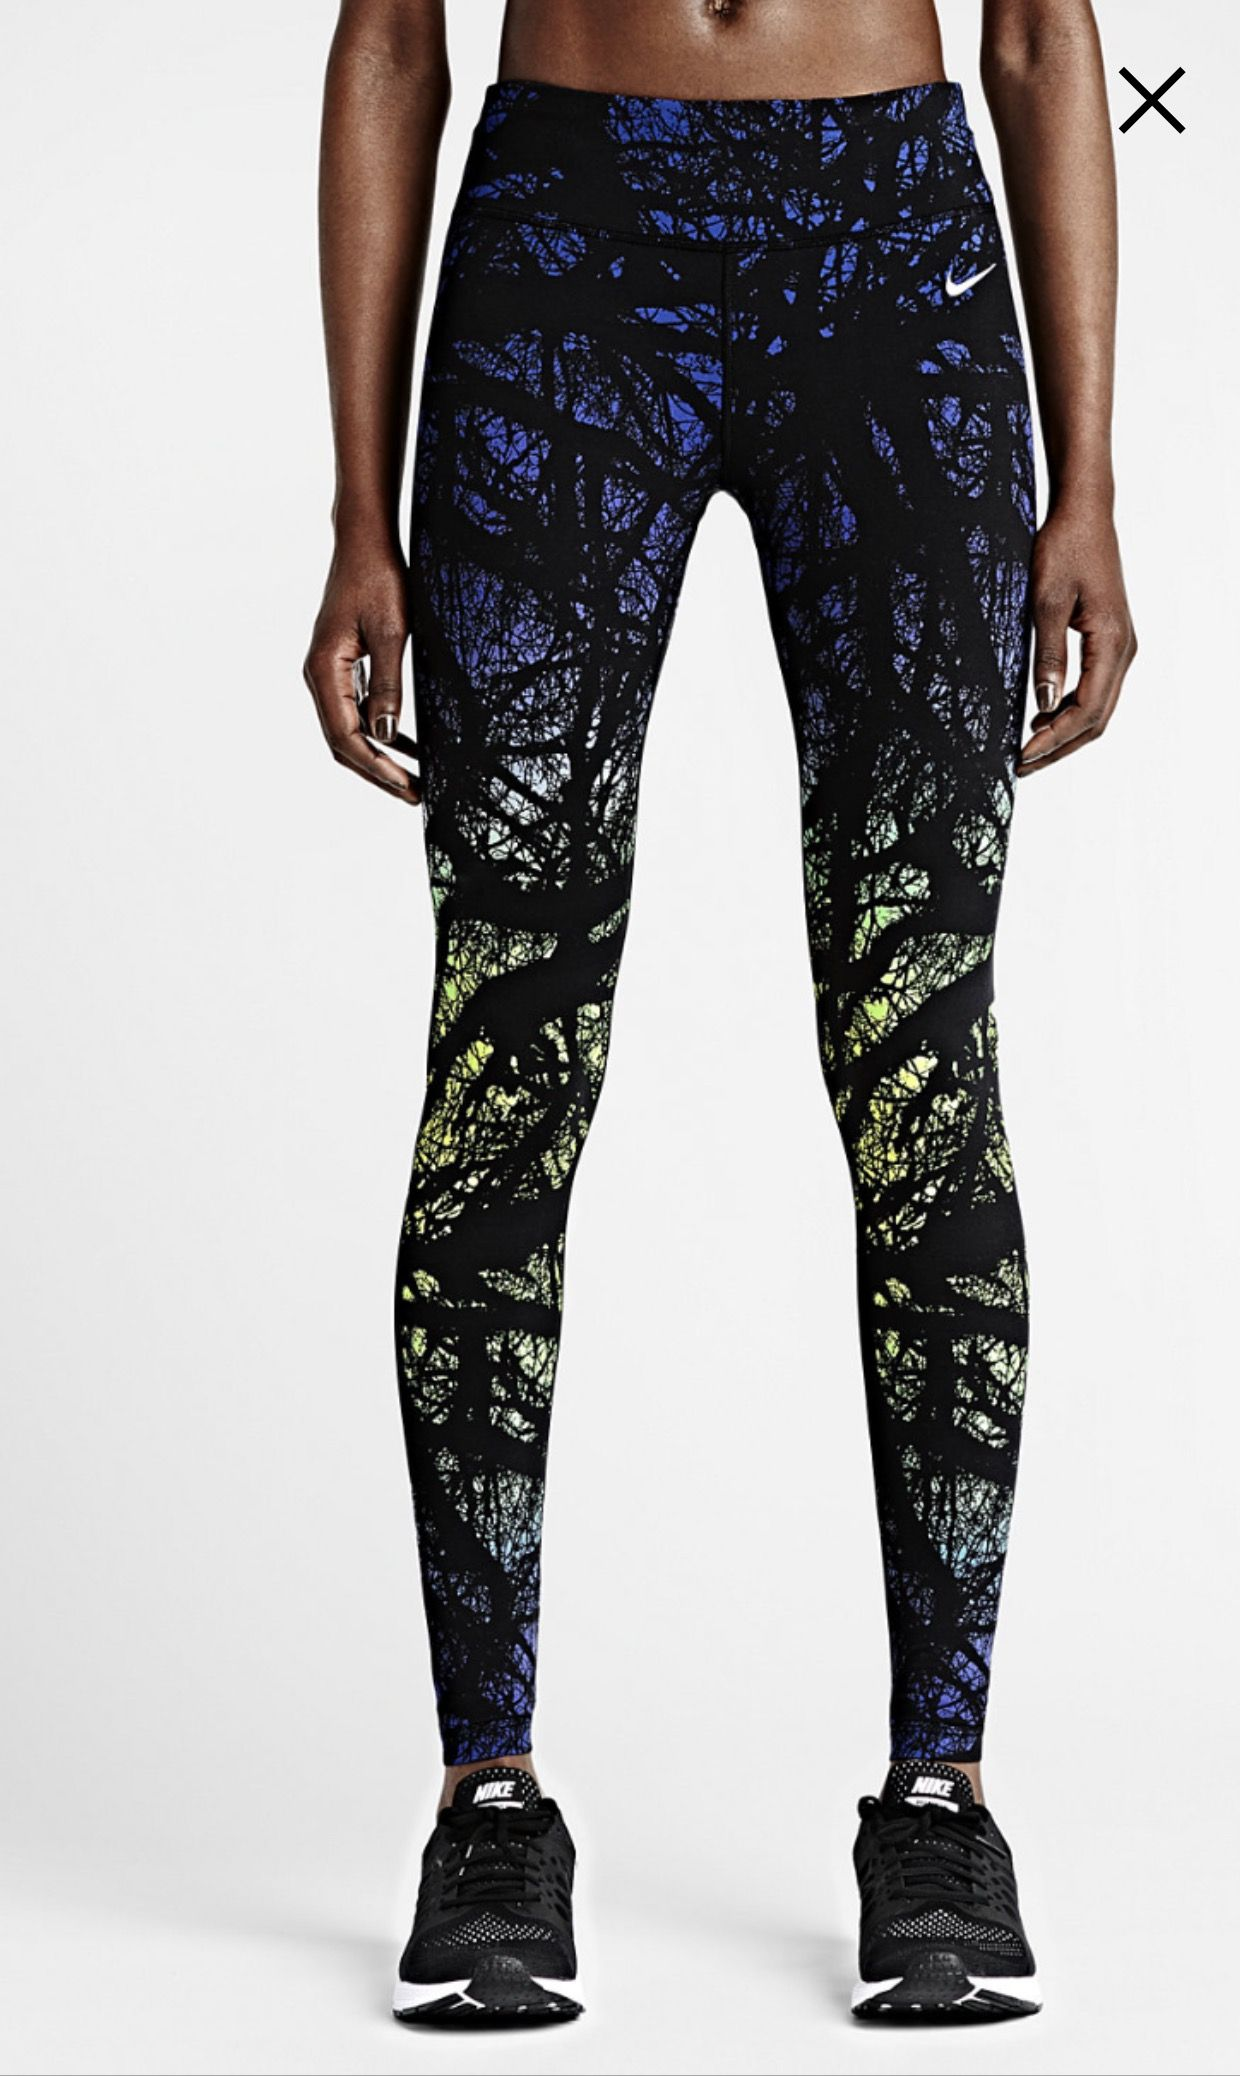 Nike printed engineered (women s running tights)  ecf299294256